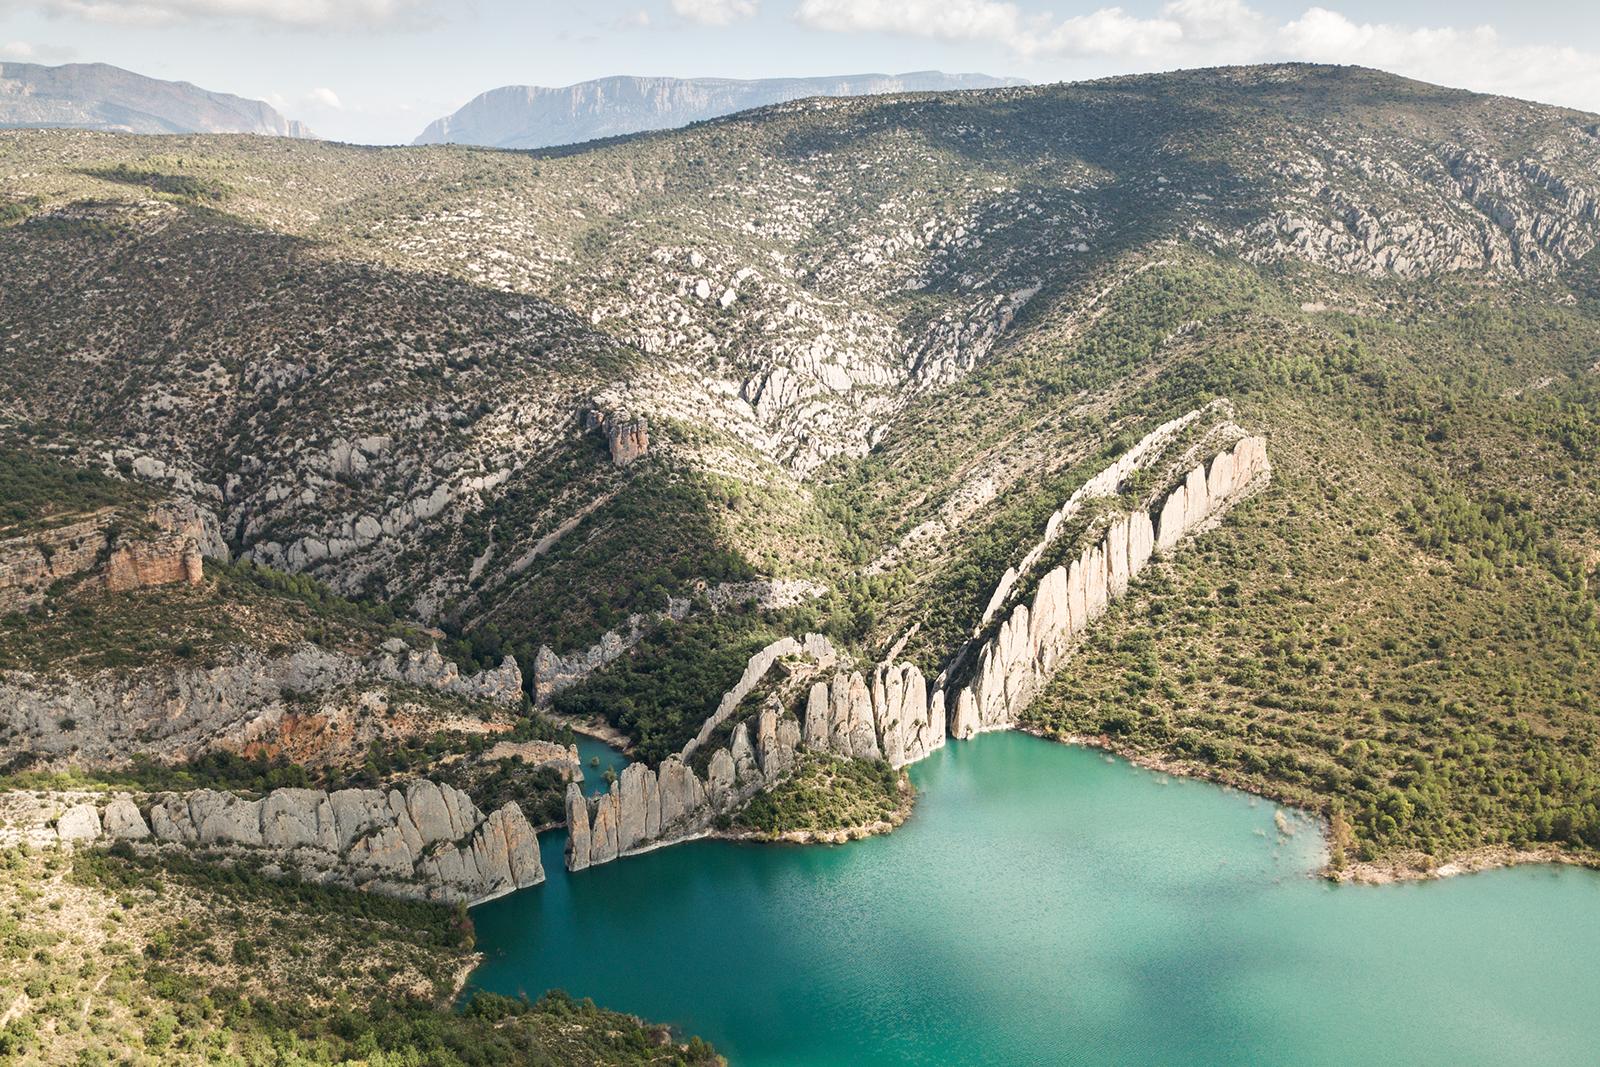 Randonnée en Aragon, les murallas de finestras